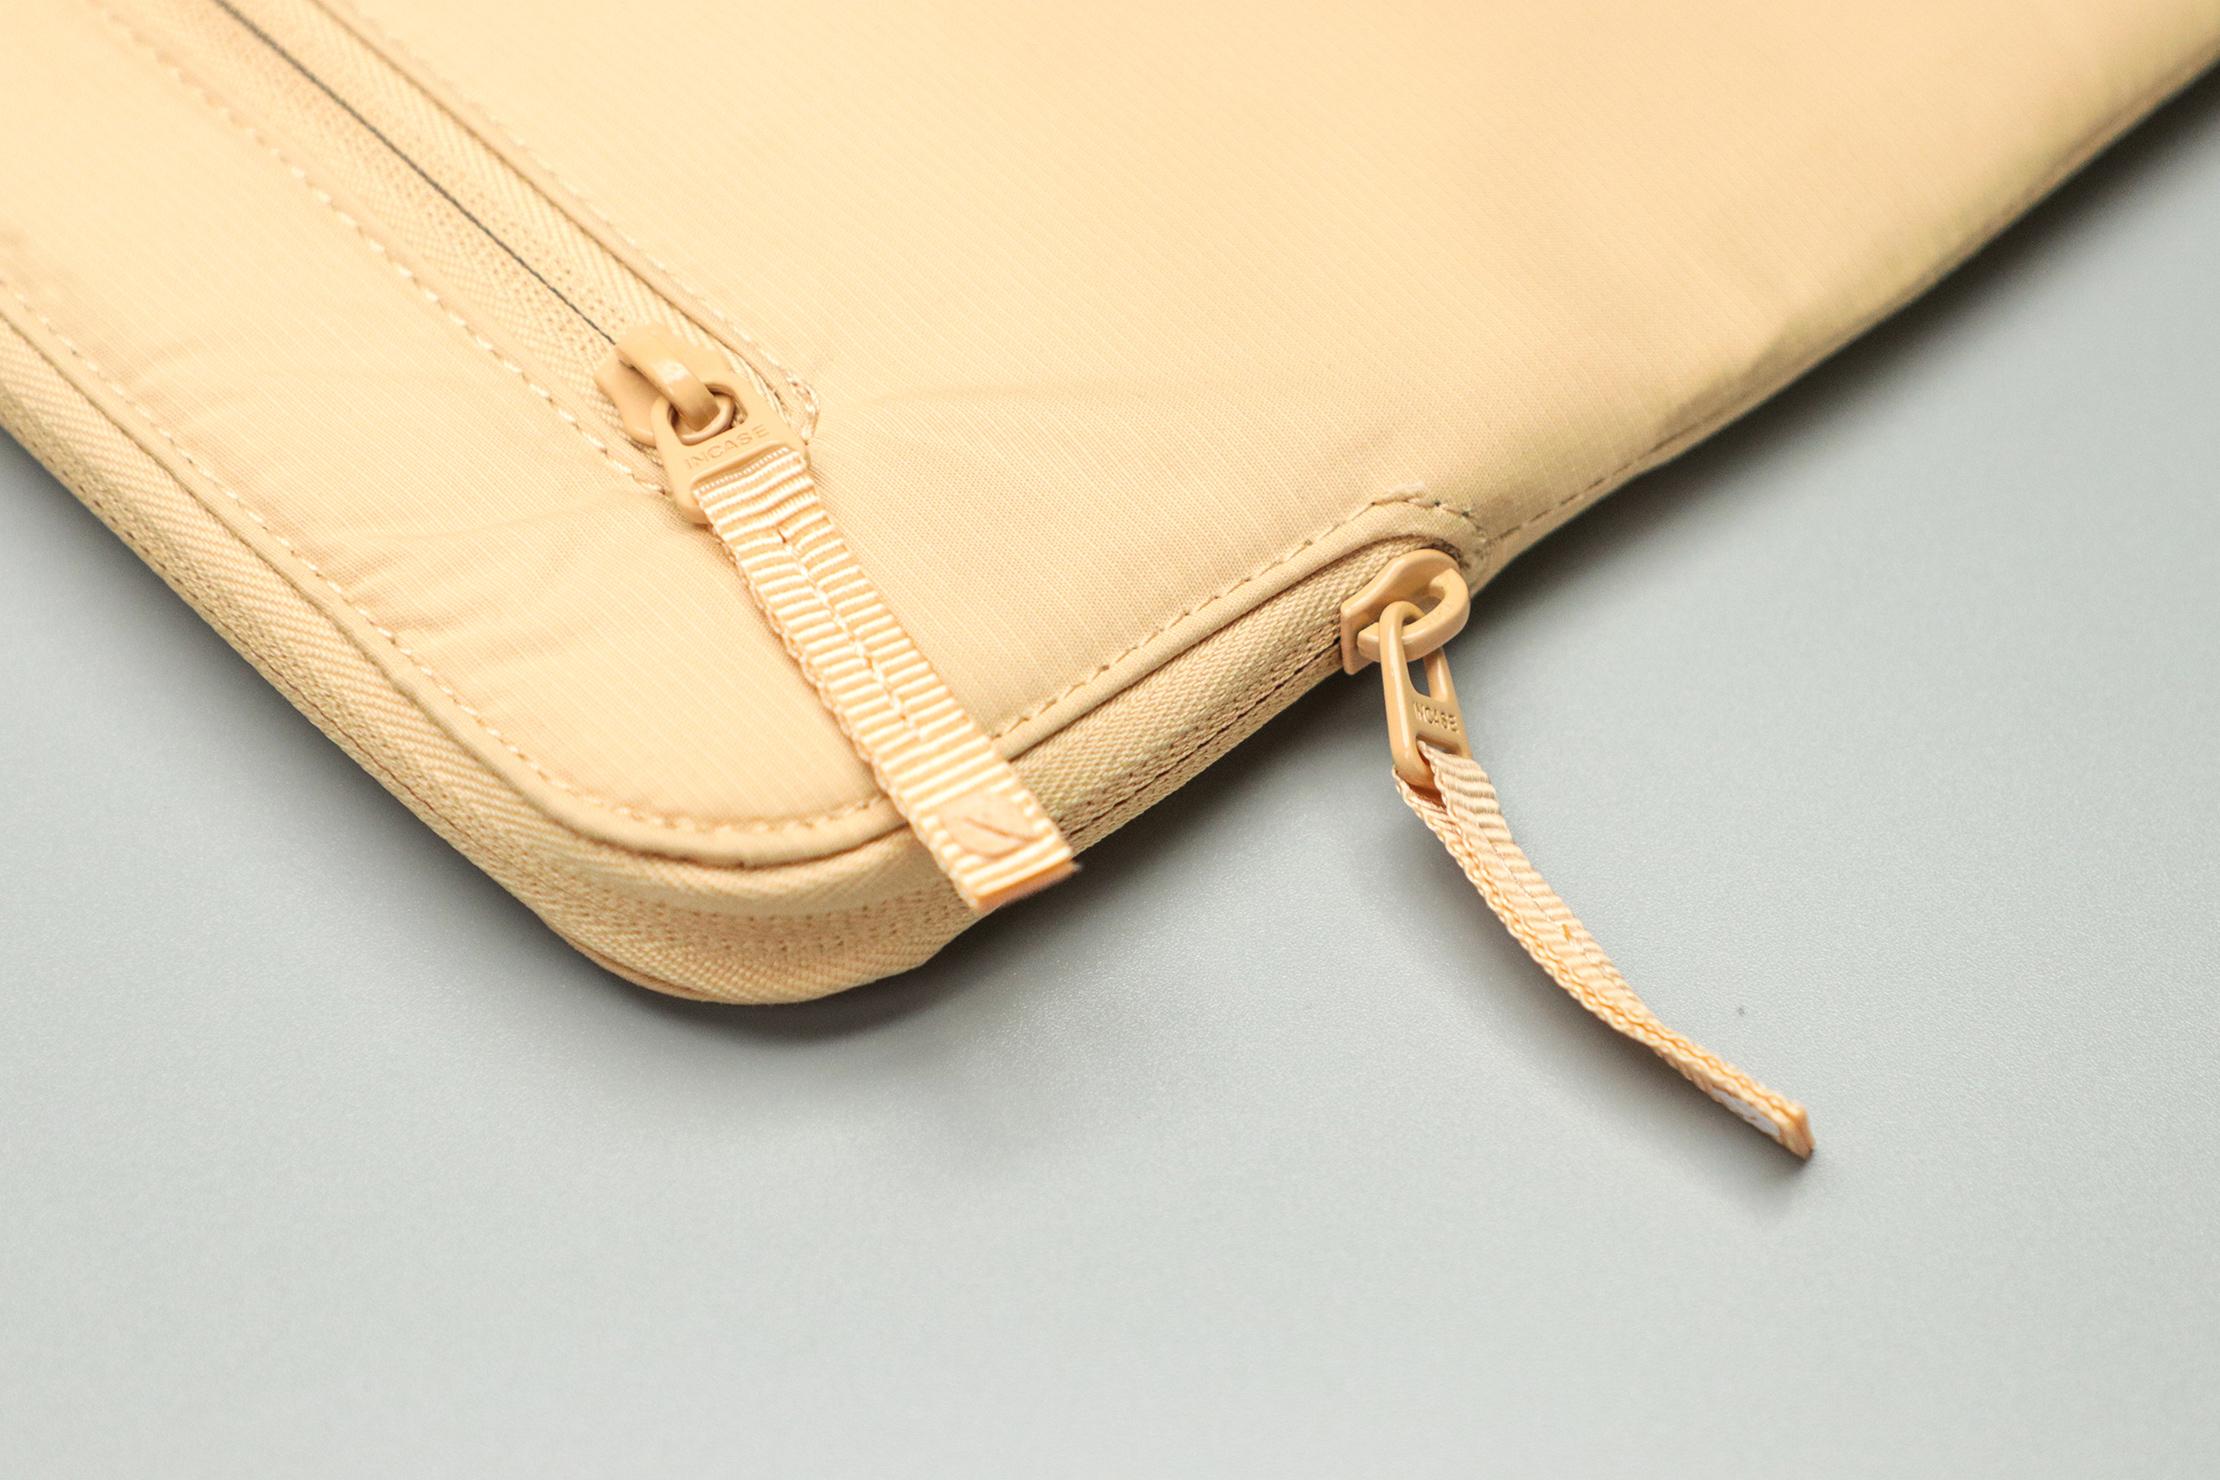 Incase Compact Sleeve with BIONIC zippers